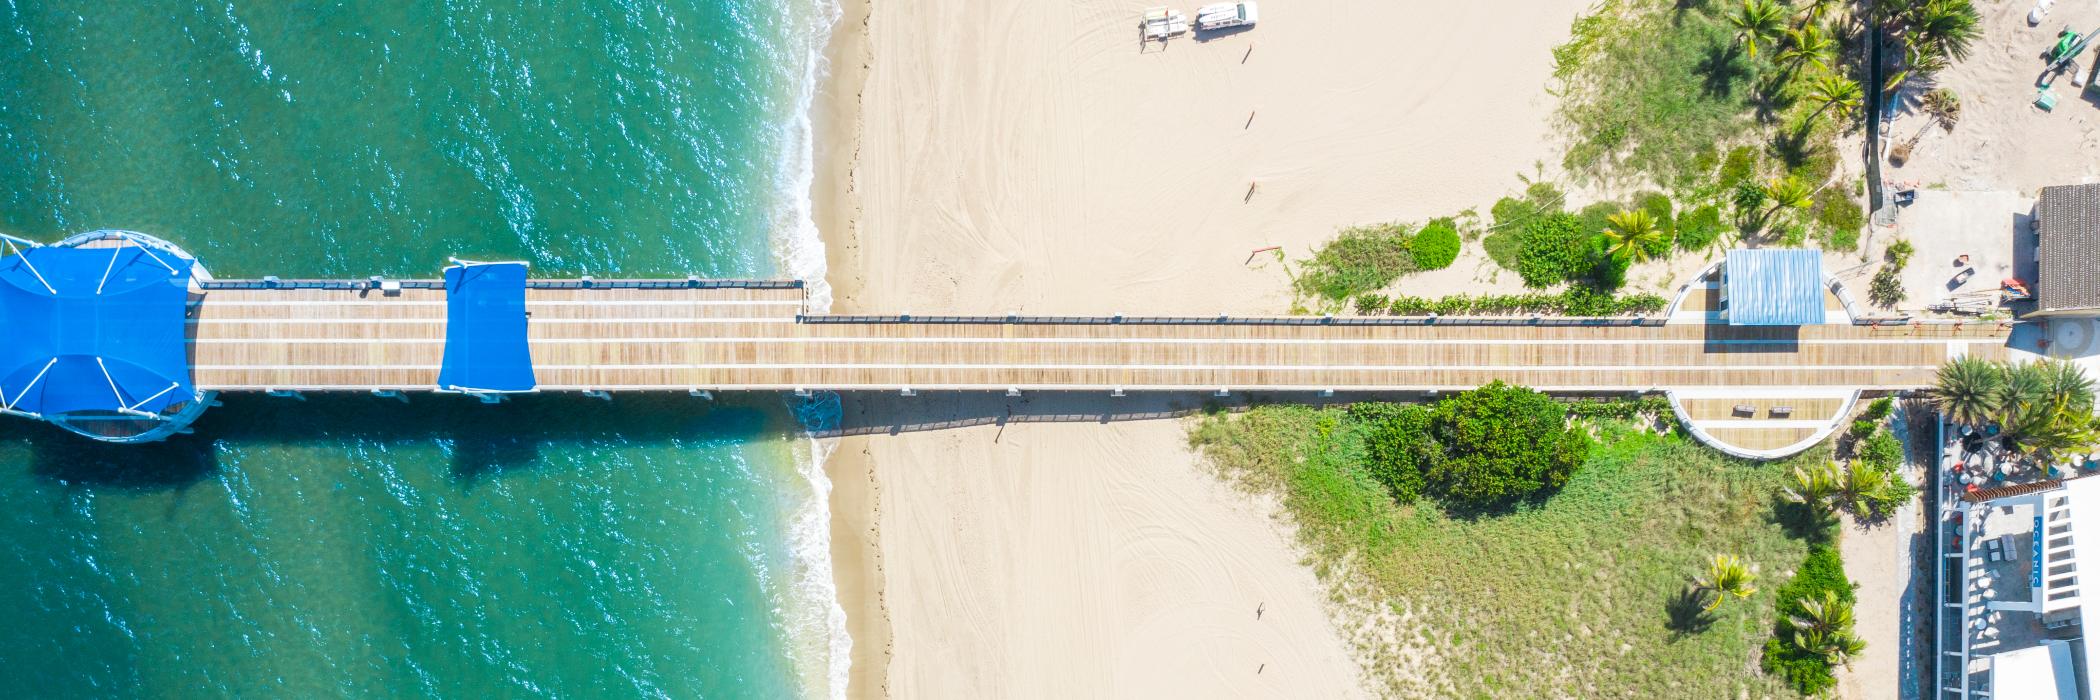 Aerial View of Ocean Boardwalk at Pompano Beach in Fort Lauderdale